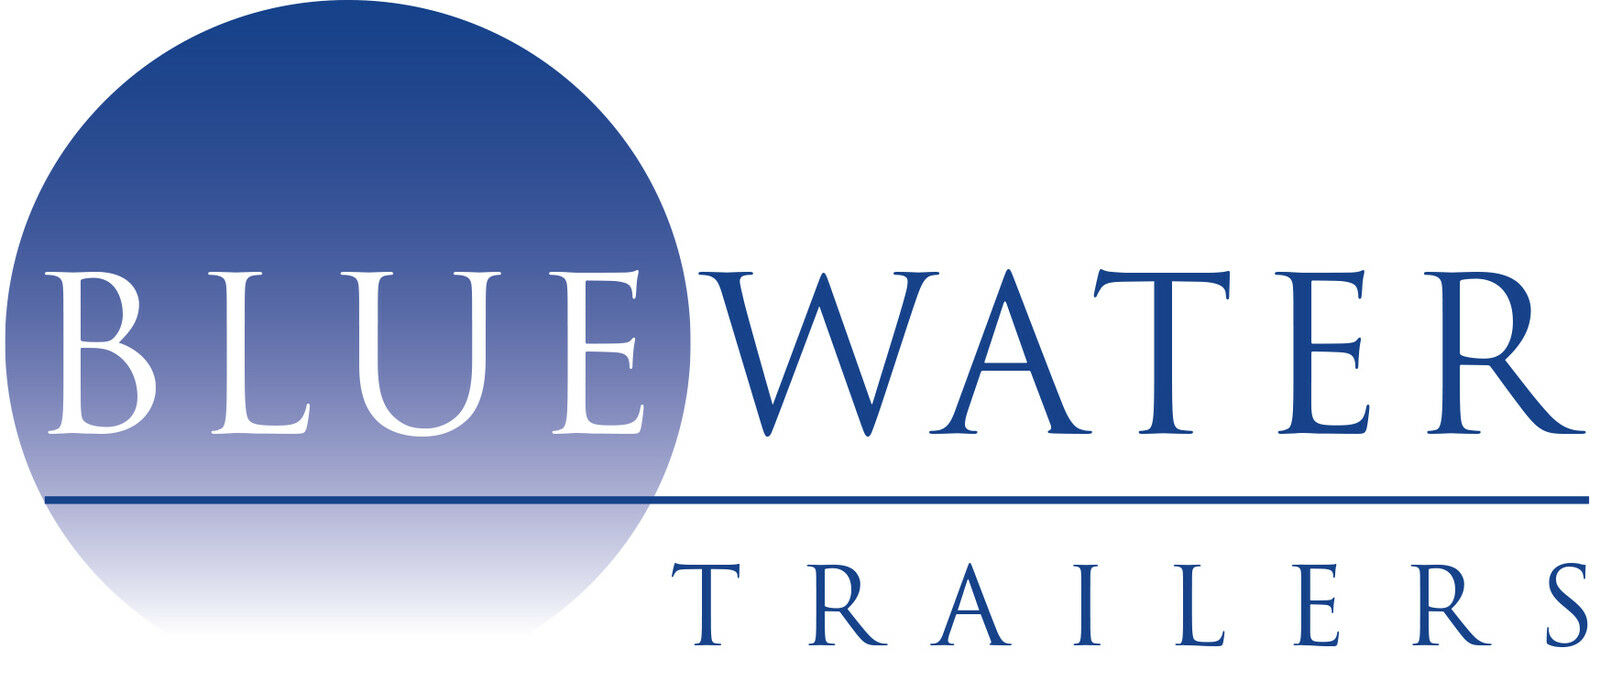 Bluewater Trailers UK Ltd